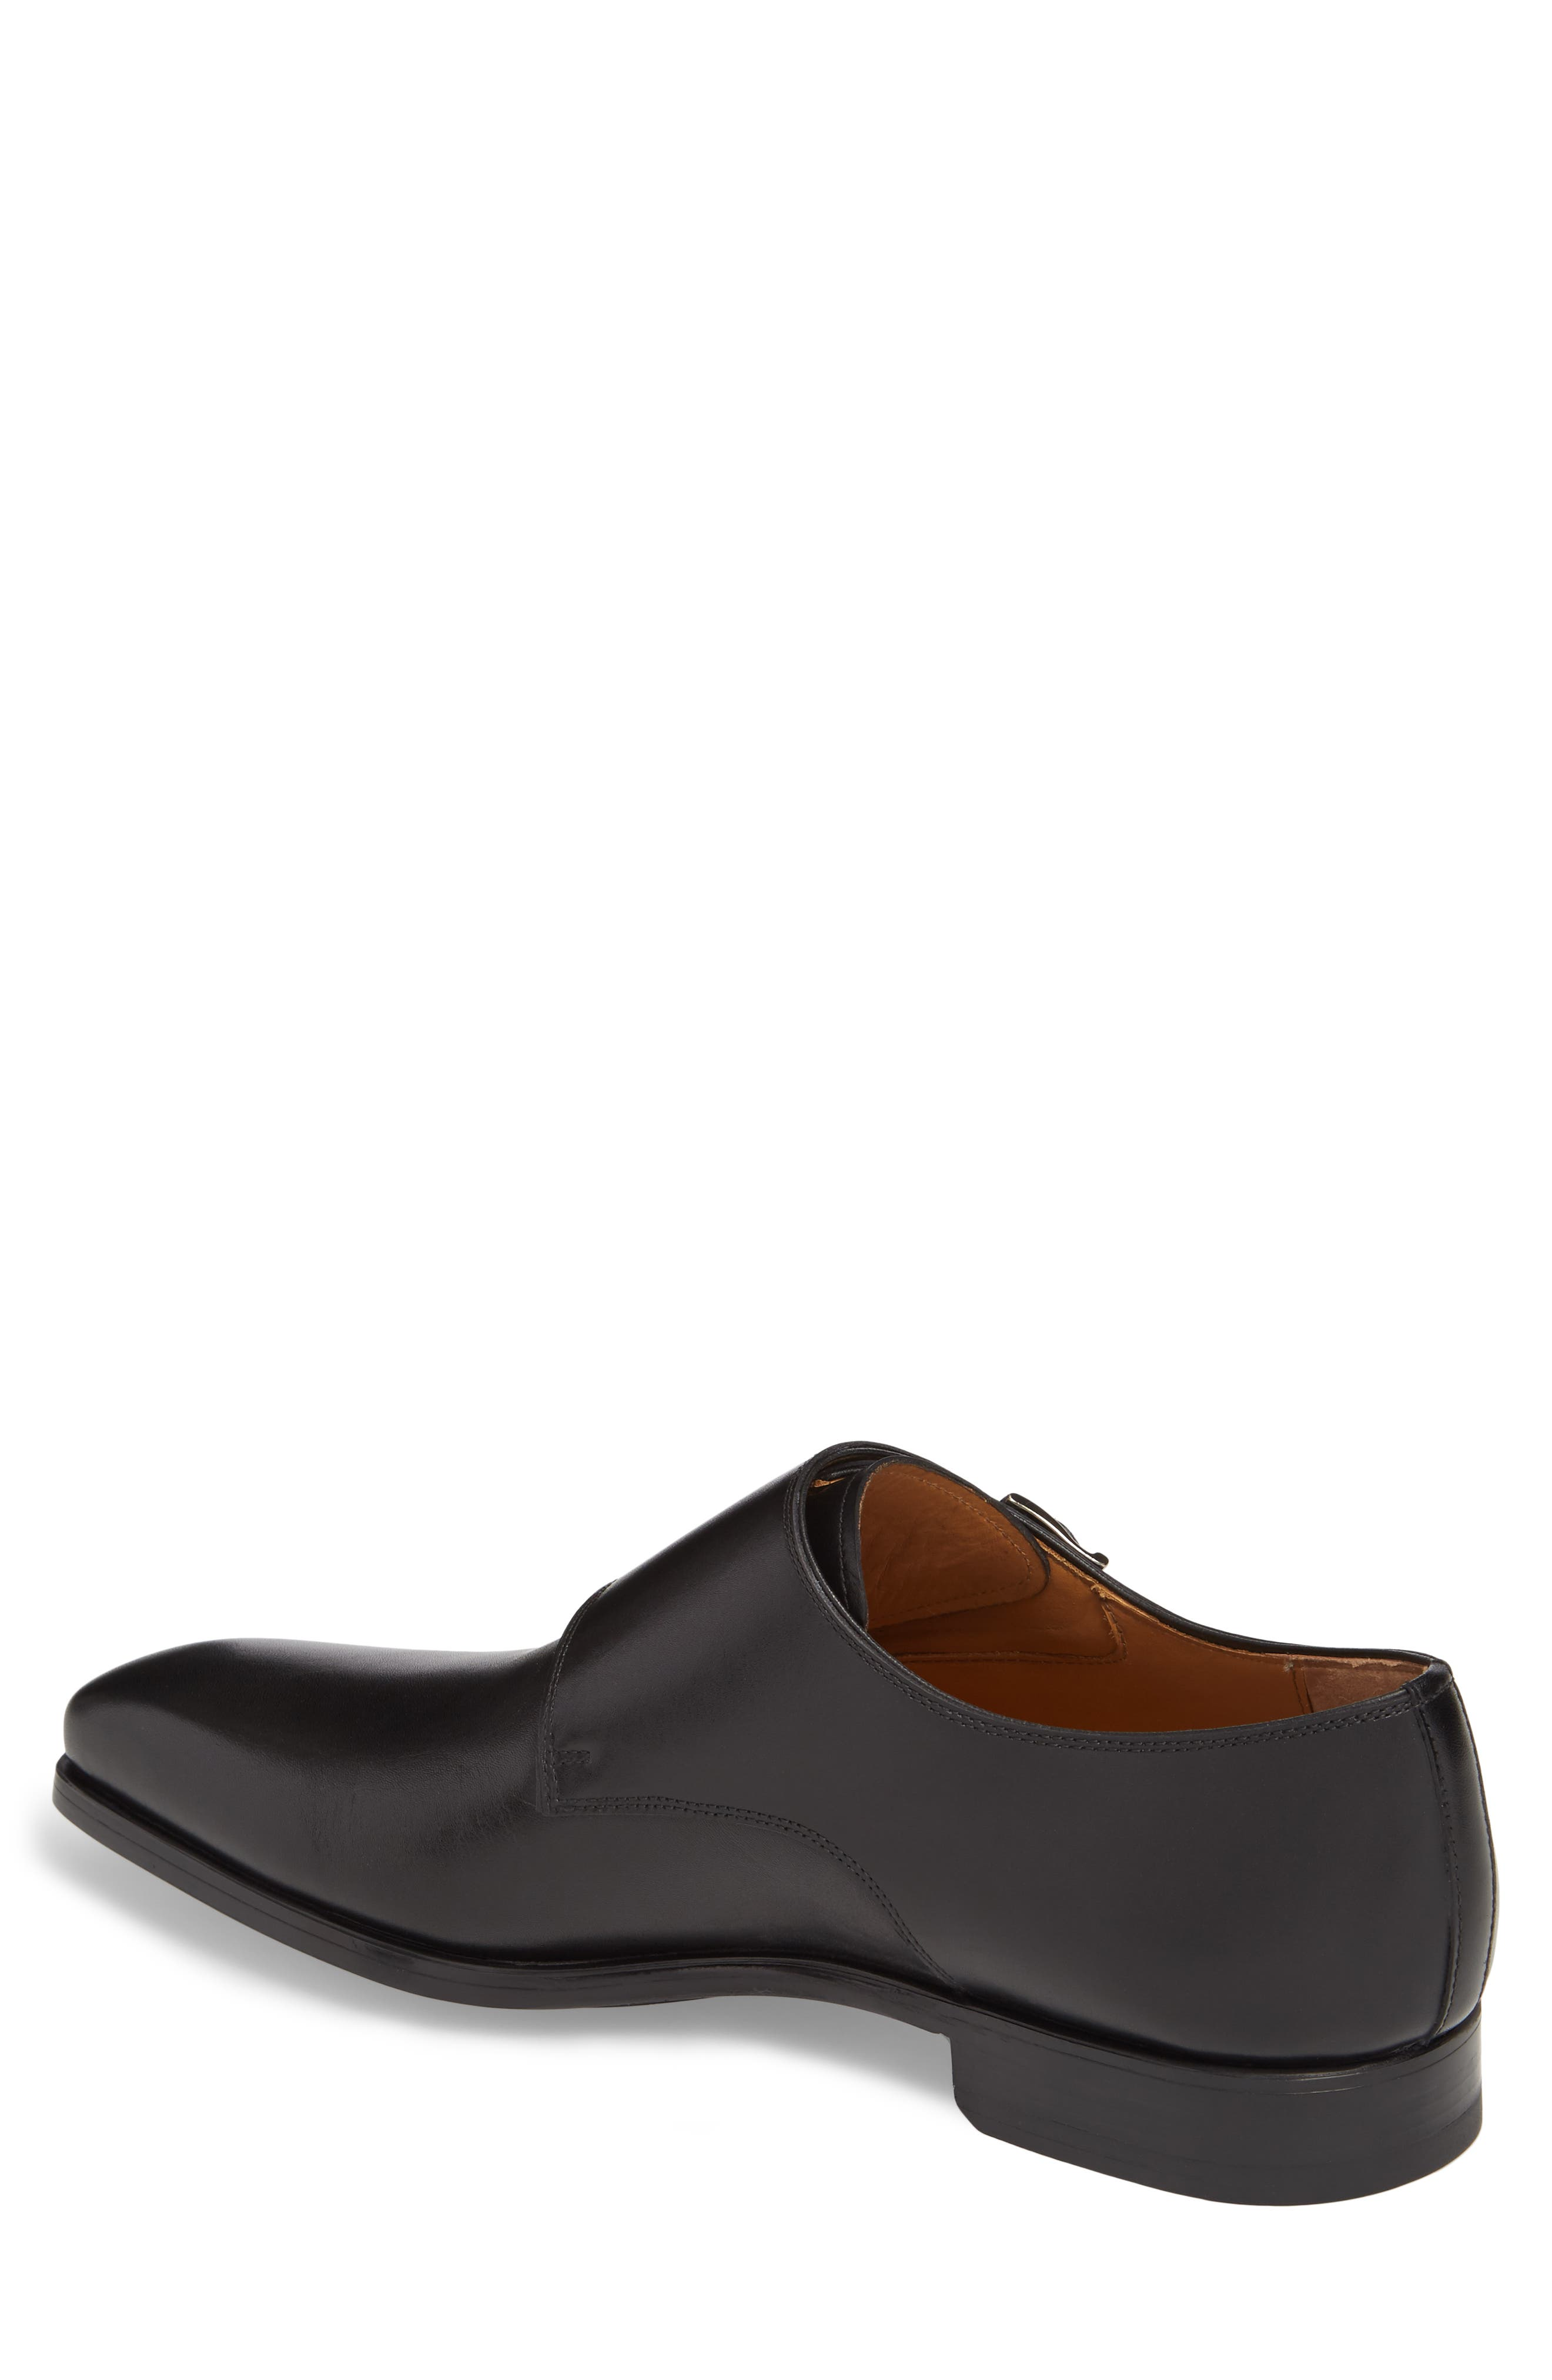 Ramolo Double Monk Strap Shoe,                             Alternate thumbnail 2, color,                             001